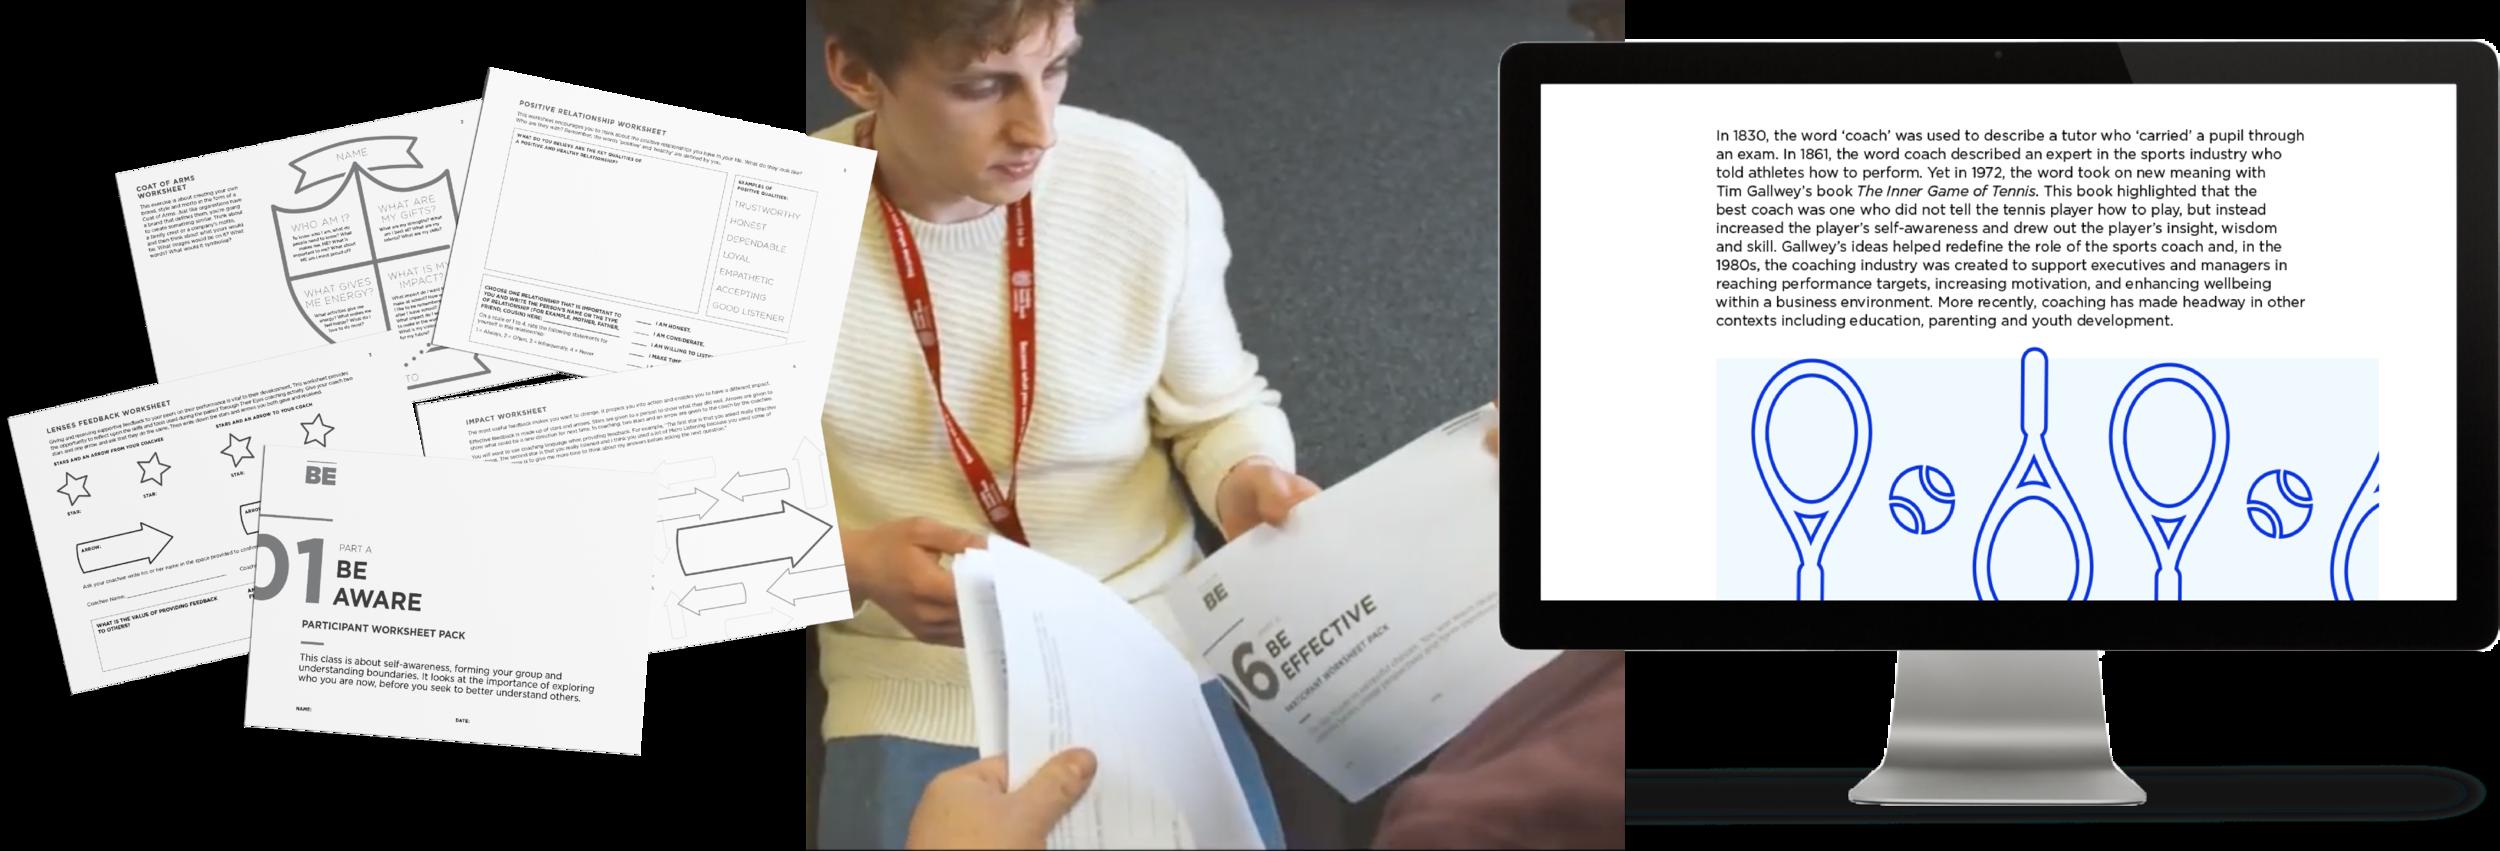 Graydin_Coaching_Courses_Schools_Educators_Teachers_Leaders_Administrators_Beginner_London_Toronto_NewYork_BeMaterials-57.png